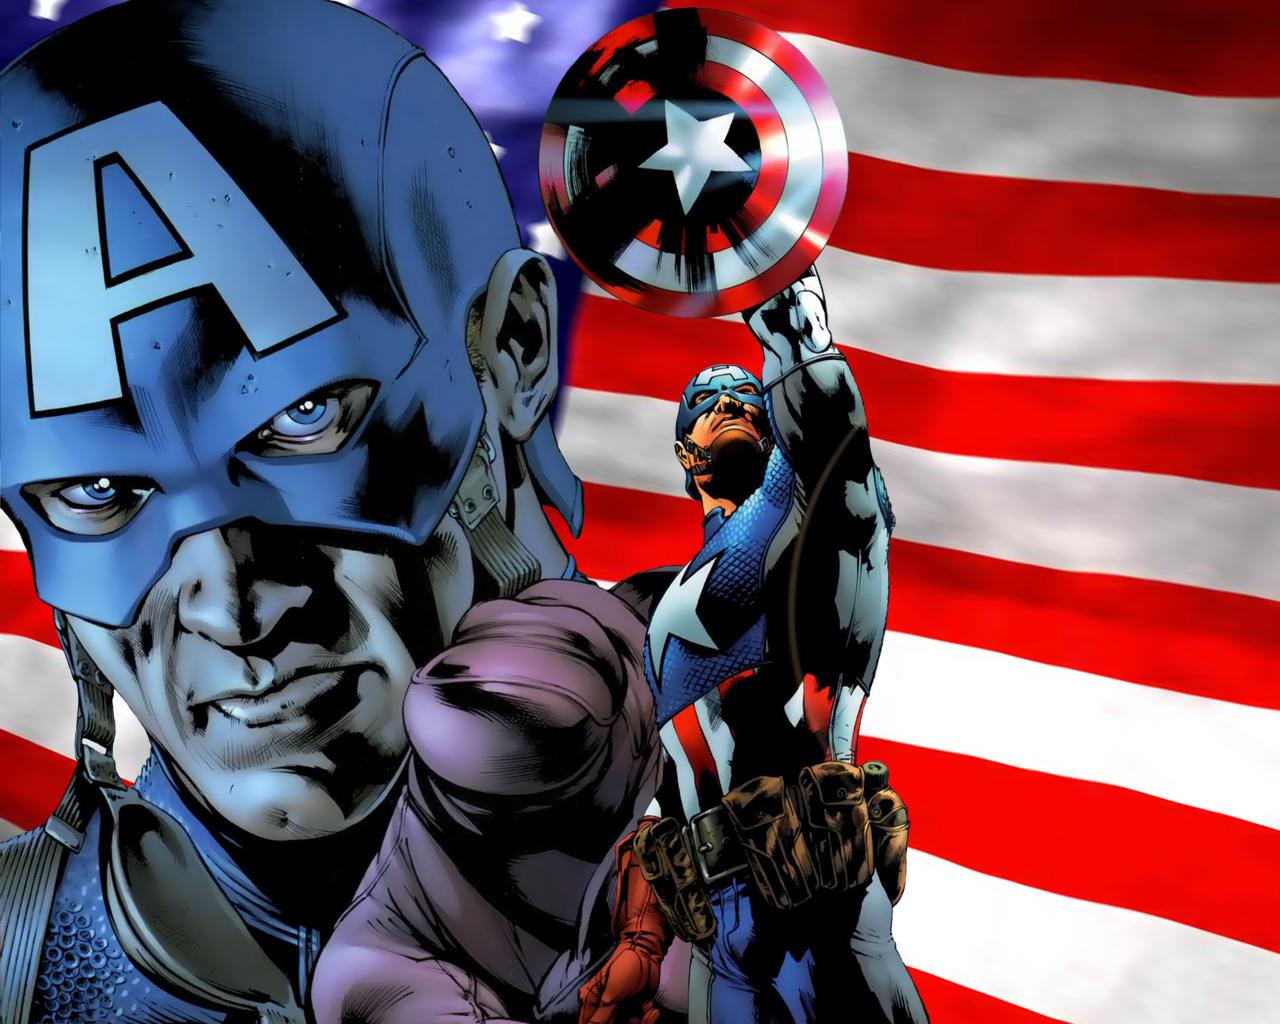 http://1.bp.blogspot.com/-b38plWJulmA/TjLNFZLPnbI/AAAAAAAADfk/g1iTZNvWRzU/s1600/wallpaper_captain_america.jpg